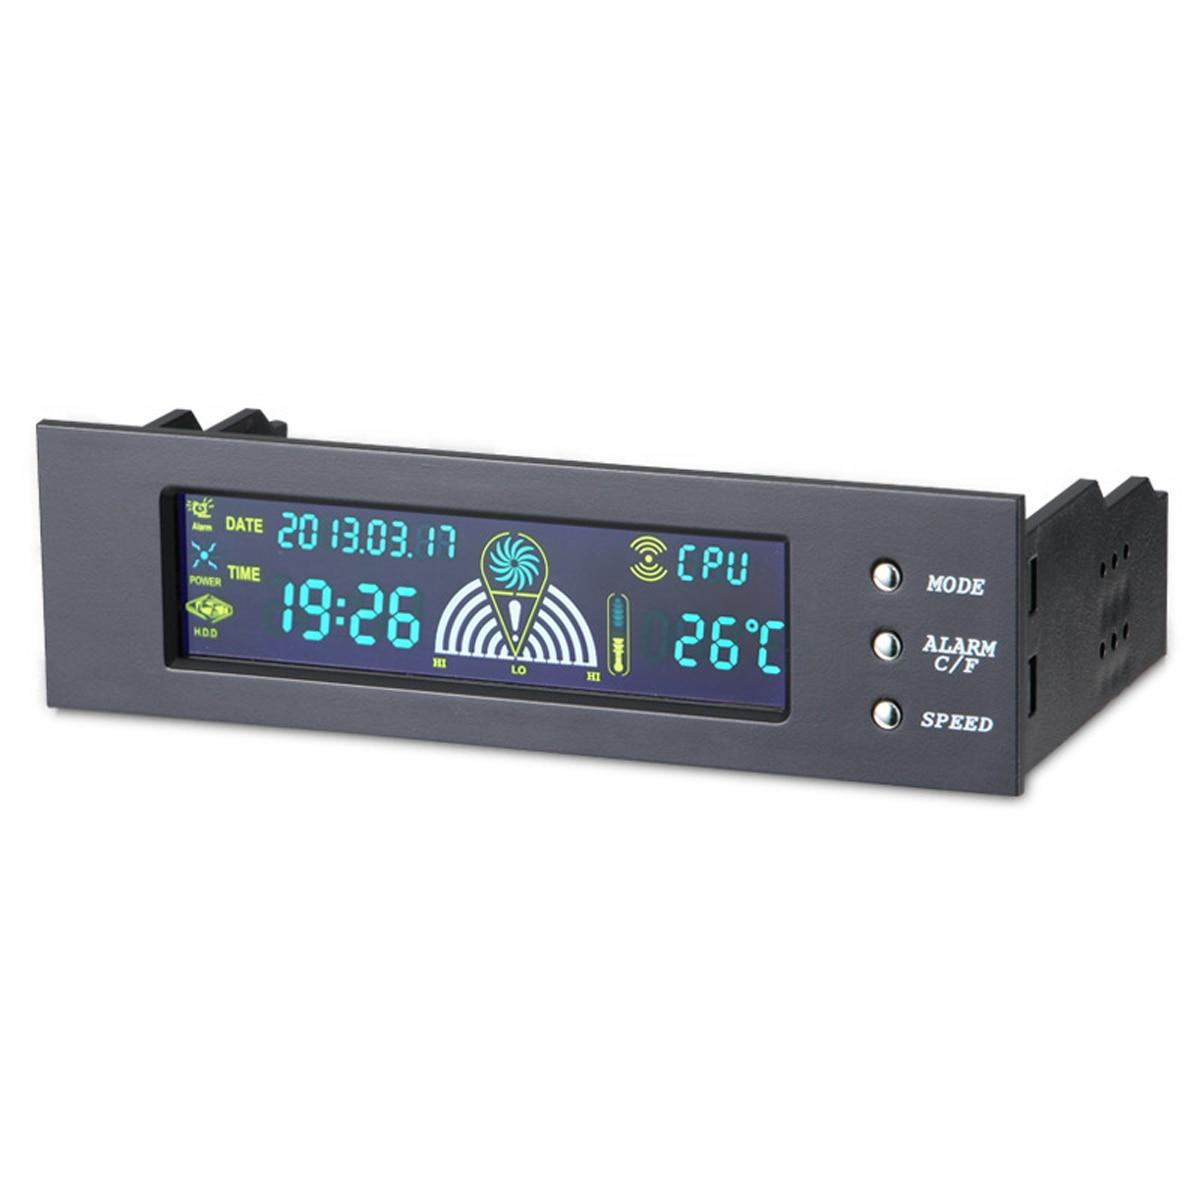 5,25 inch PC Computer Fan Controller Vorne LCD Panel 3 Fan Speed Controller CPU Temperatur Sensor LCD Digital Display für PC